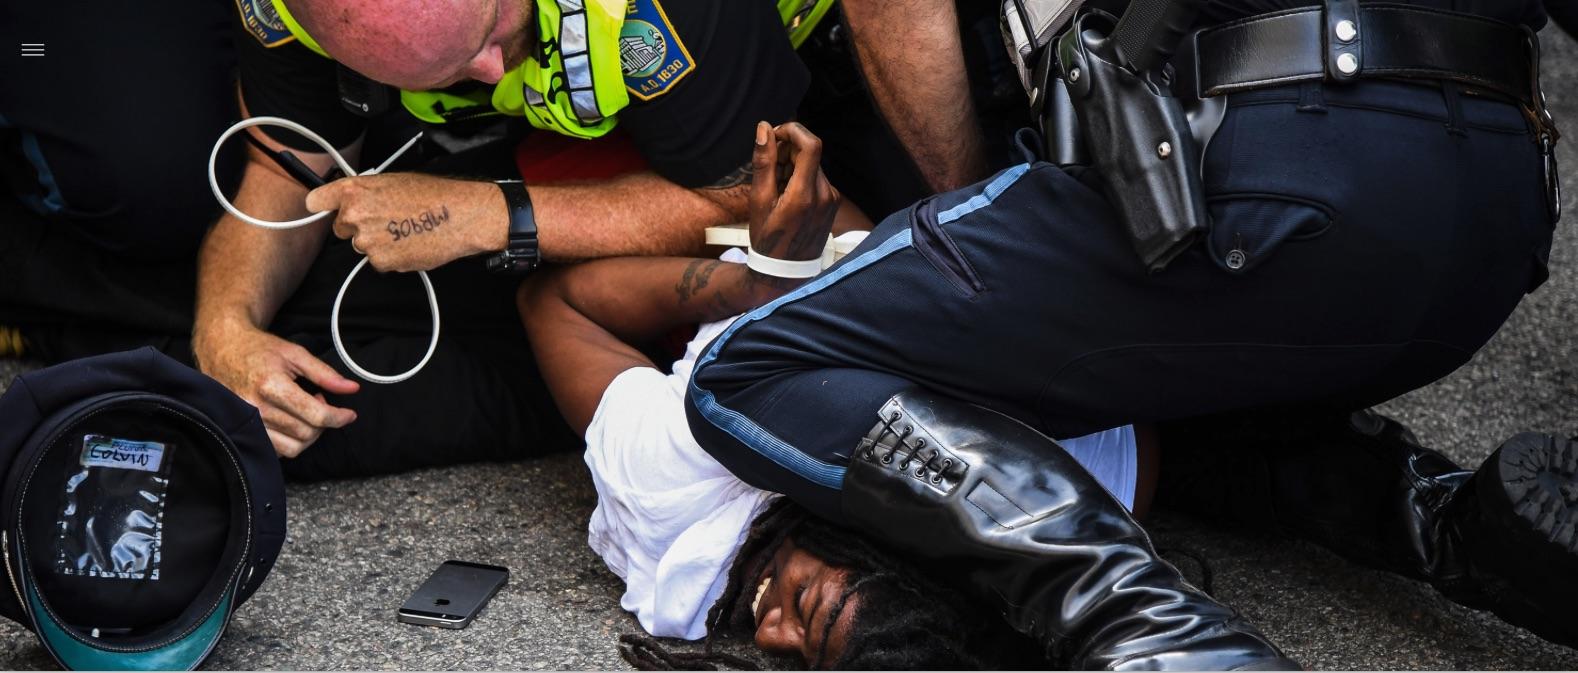 boston protest.jpg